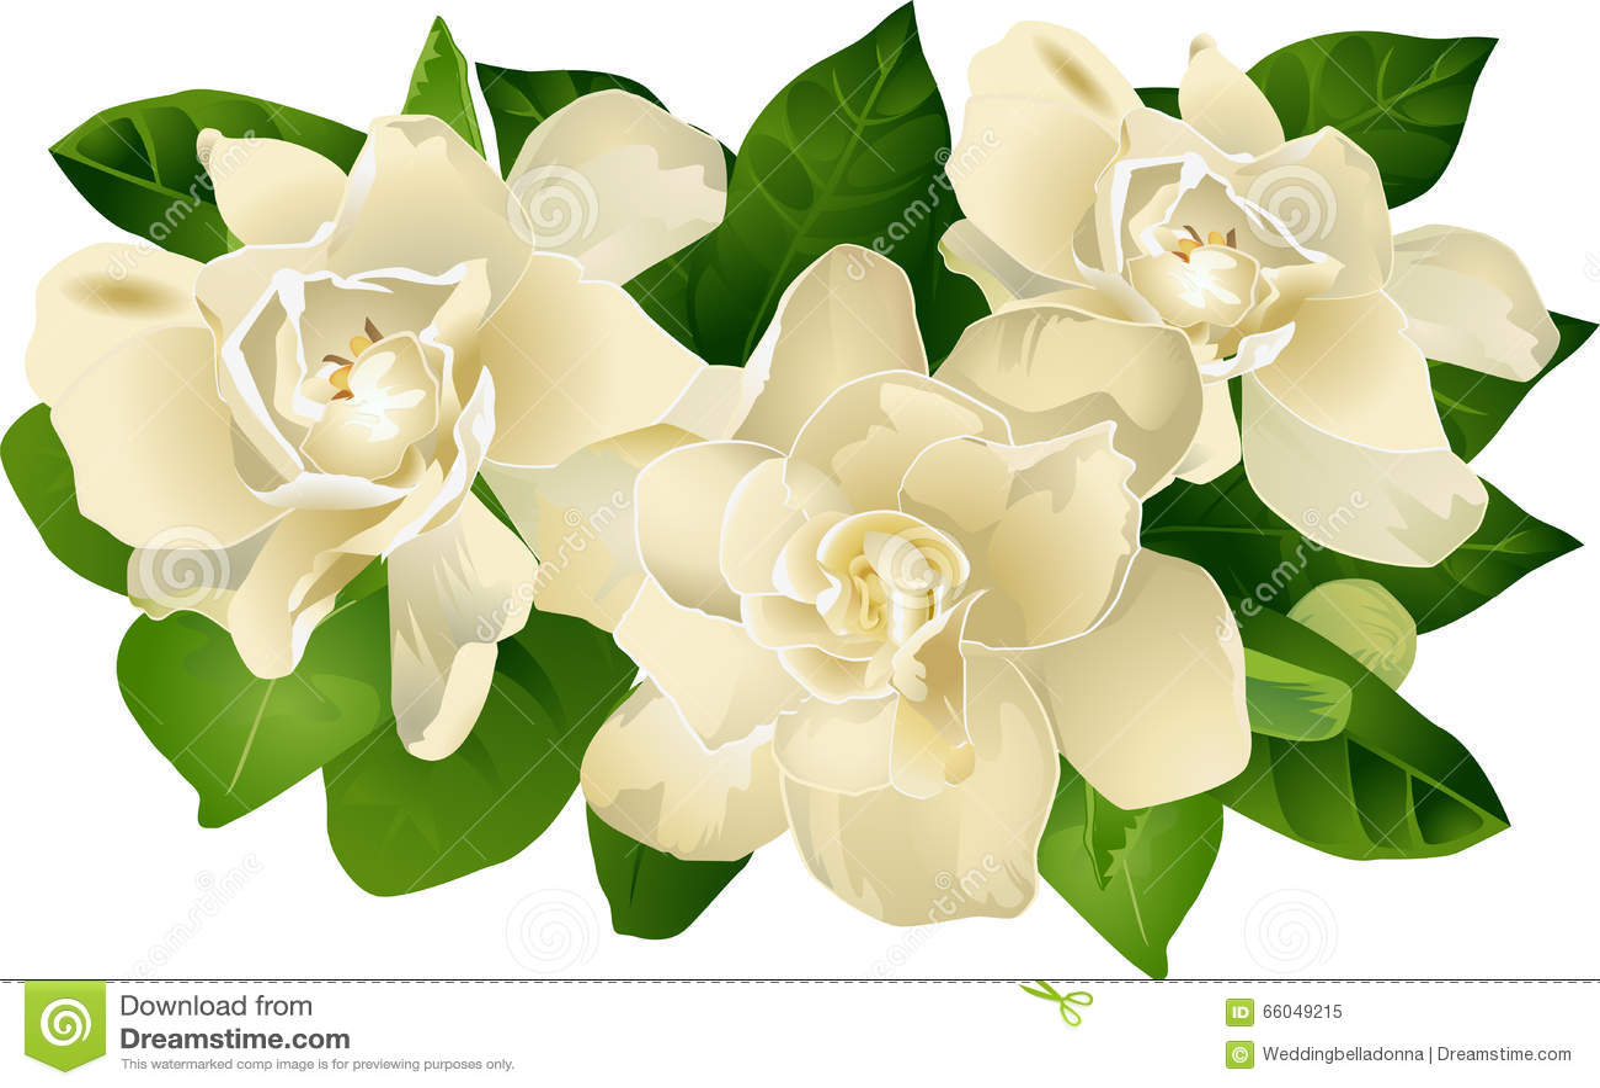 0118160bc106 Gardenia Floral Grouping stock illustration. Illustration of ...